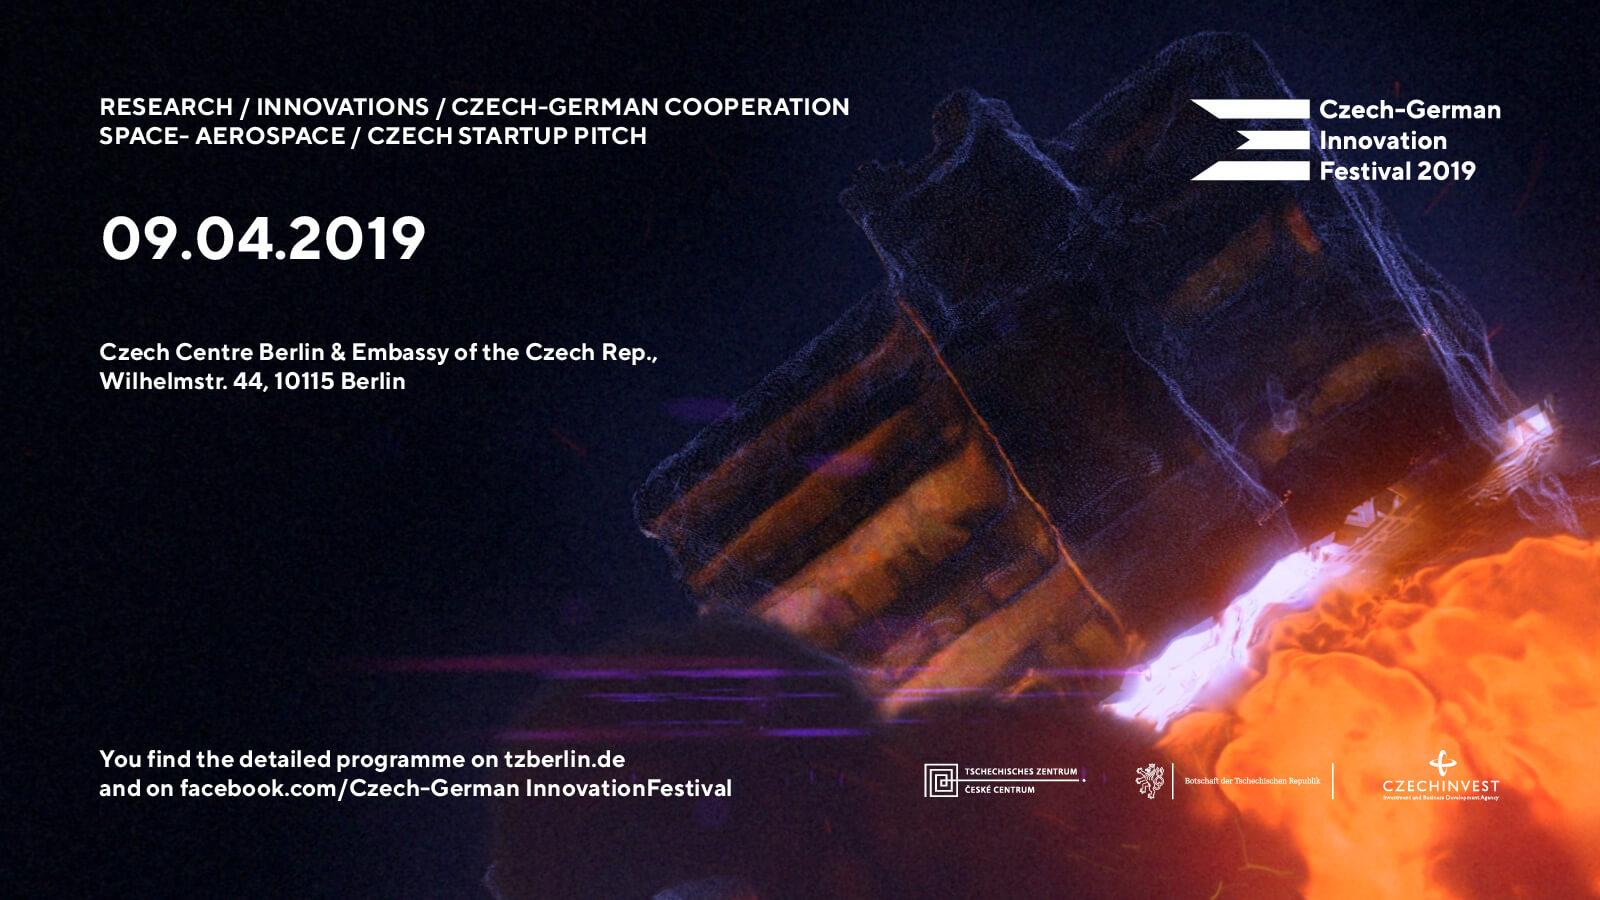 Czech-German Innovation Festival 2019